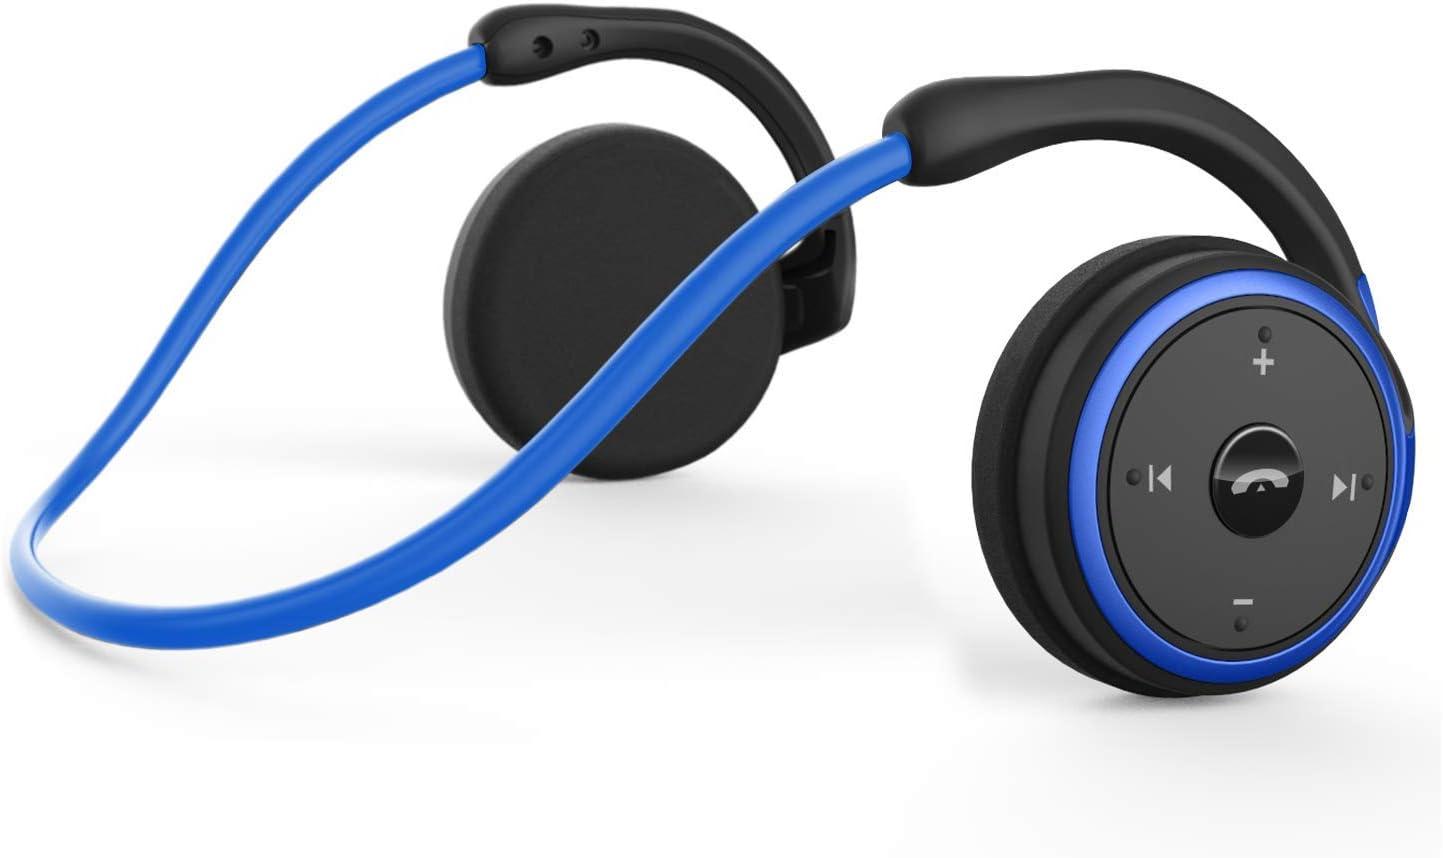 KAMTRON Auriculares Bluetooth 4.2 Running,Cascos Inalámbricos Deportivos Resistente al Sudor con Micrófono Incorporado